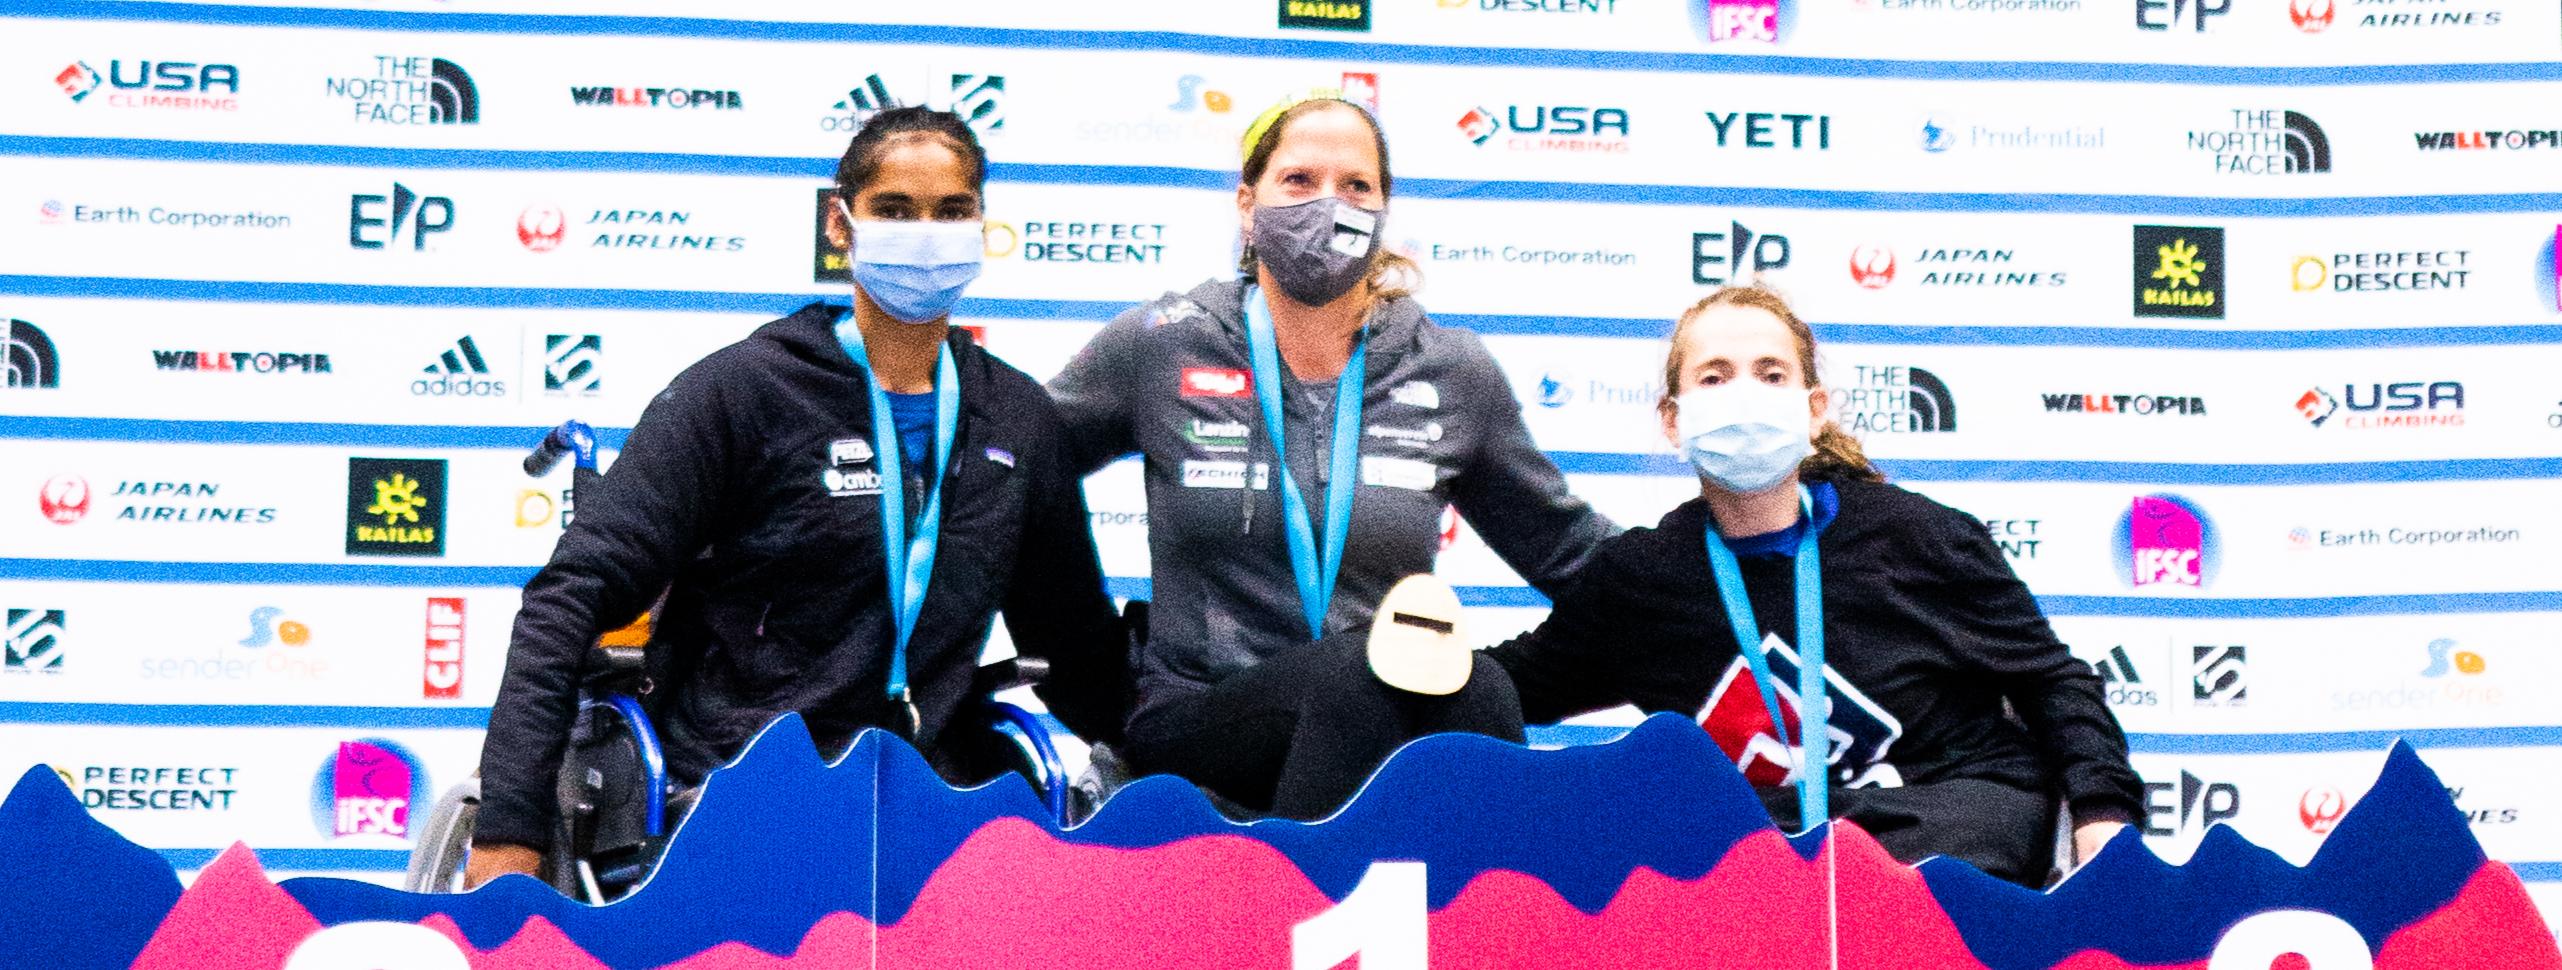 JAPAN, USA, AUSTRIA, BELGIUM, FRANCE AND ISRAEL WIN PARACLIMBING GOLD IN LOS ANGELES